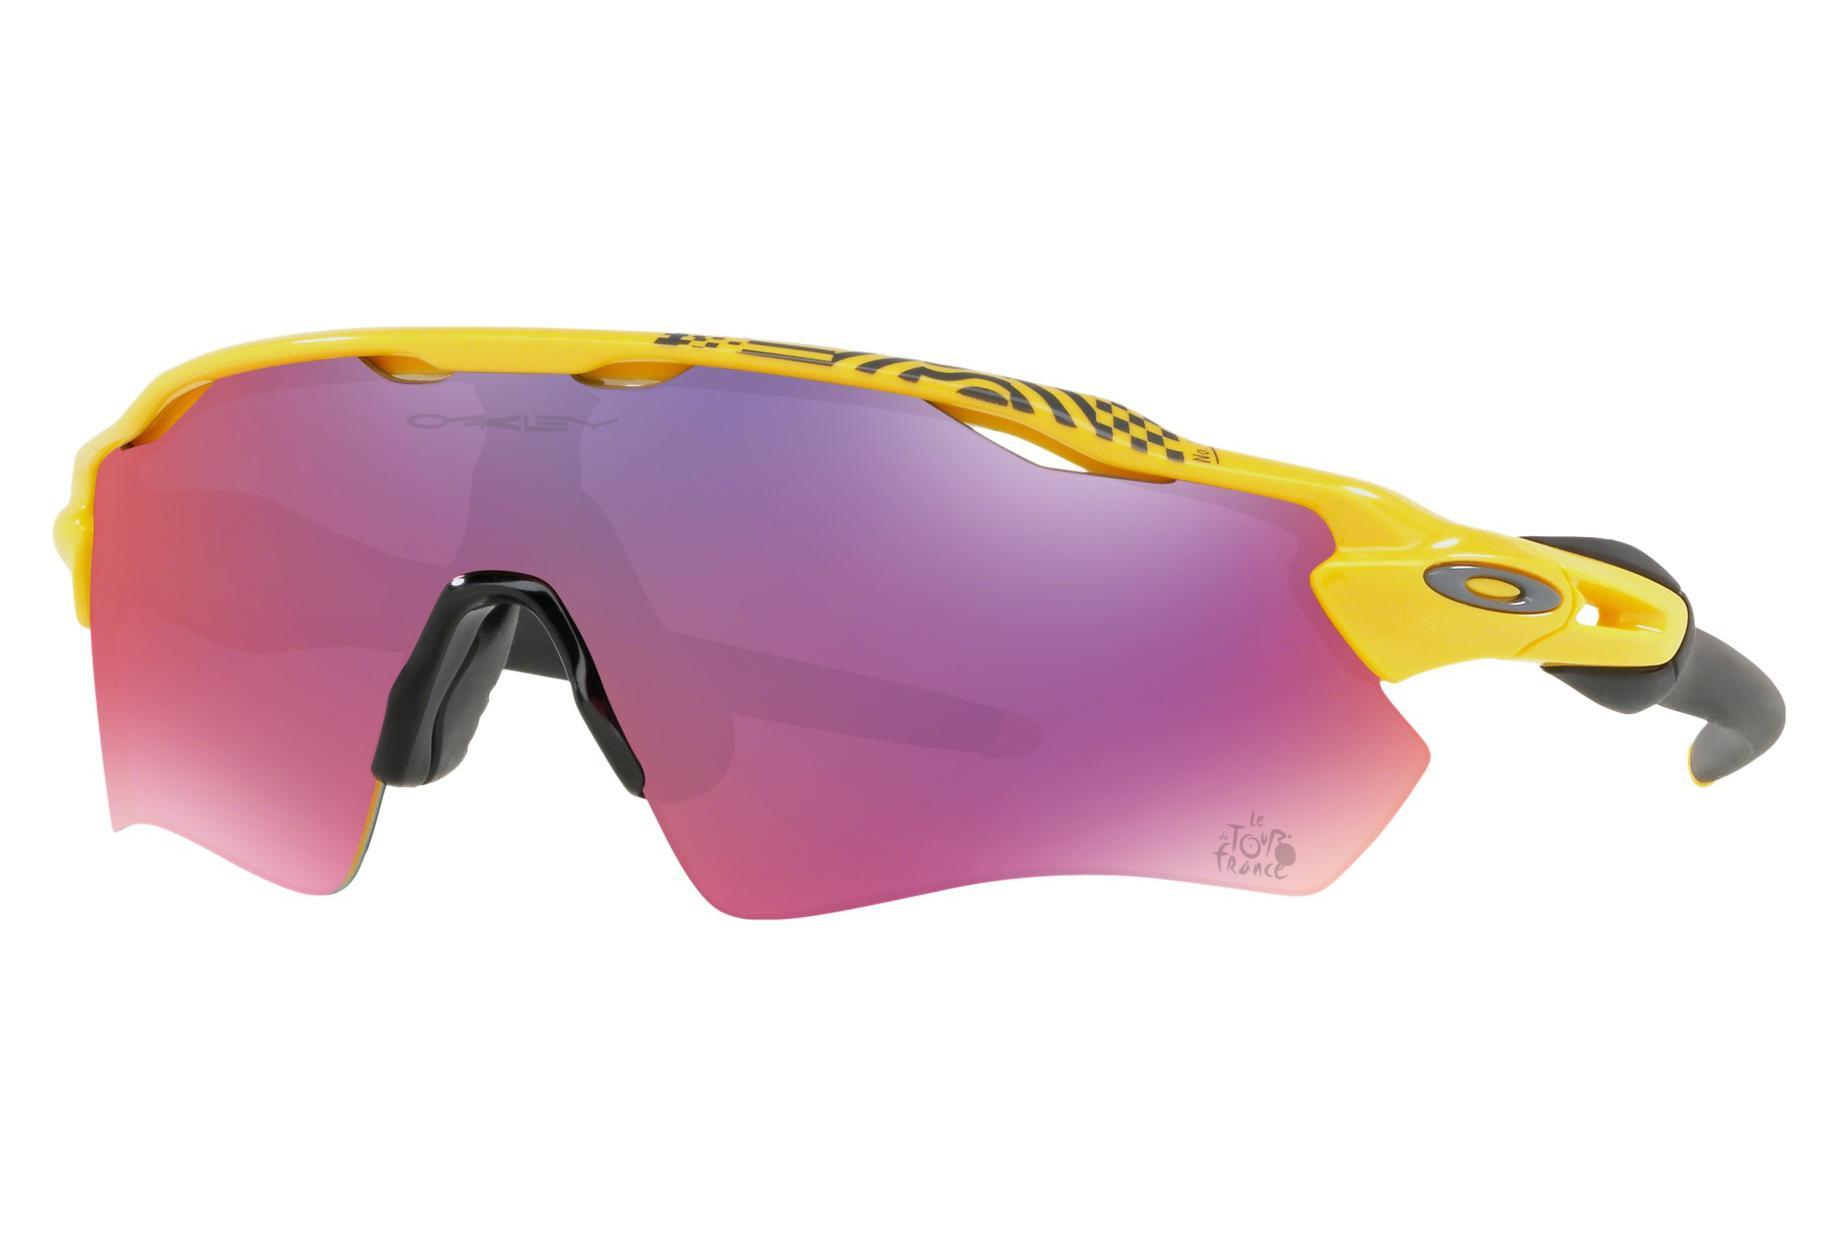 b91f98e61772 cheapest oakley sunglasses radar speed c5c45 83802